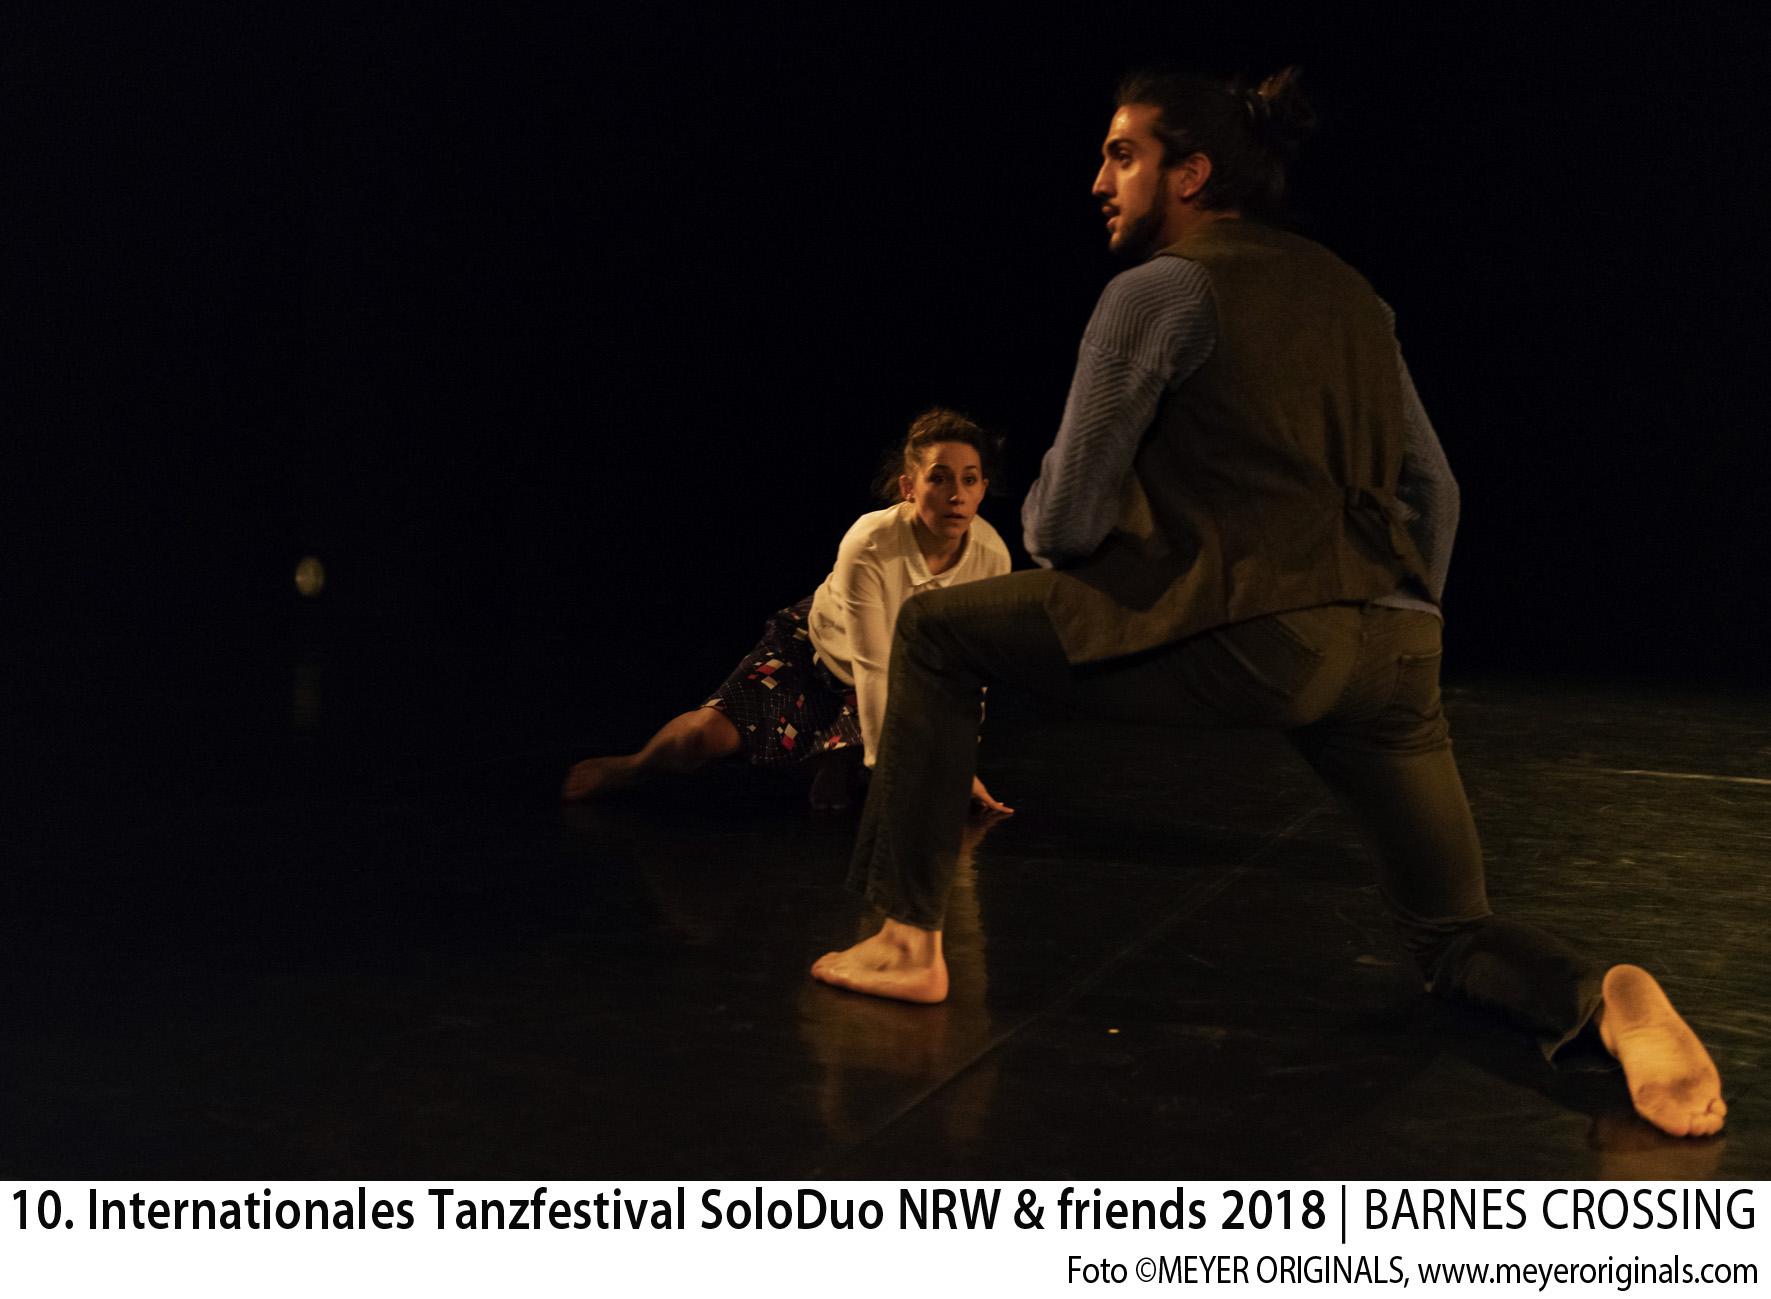 "10. Internationales Tanzfestival SoloDuo NRW + Friends 2018 BEST NEWCOMER DUO: ""BRUT-E"" Maxim Campistron & Angélique Verger (Company WAO) (F)"